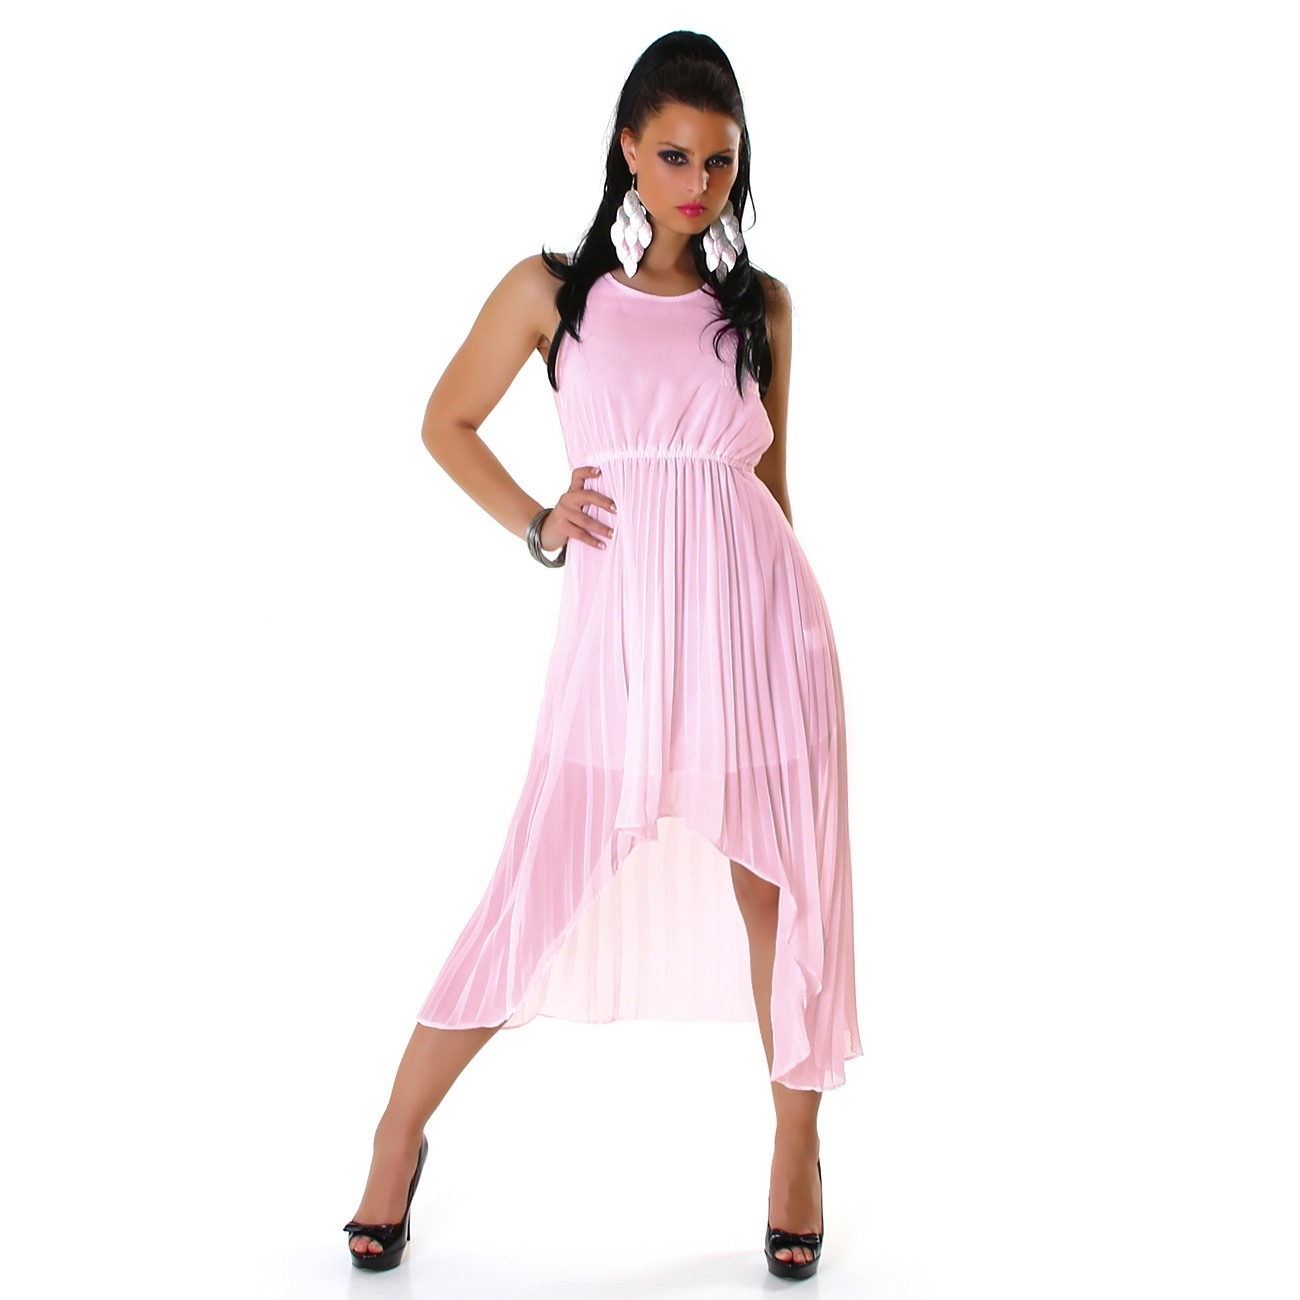 Genial Abiball Kleid Bester PreisFormal Luxus Abiball Kleid Ärmel